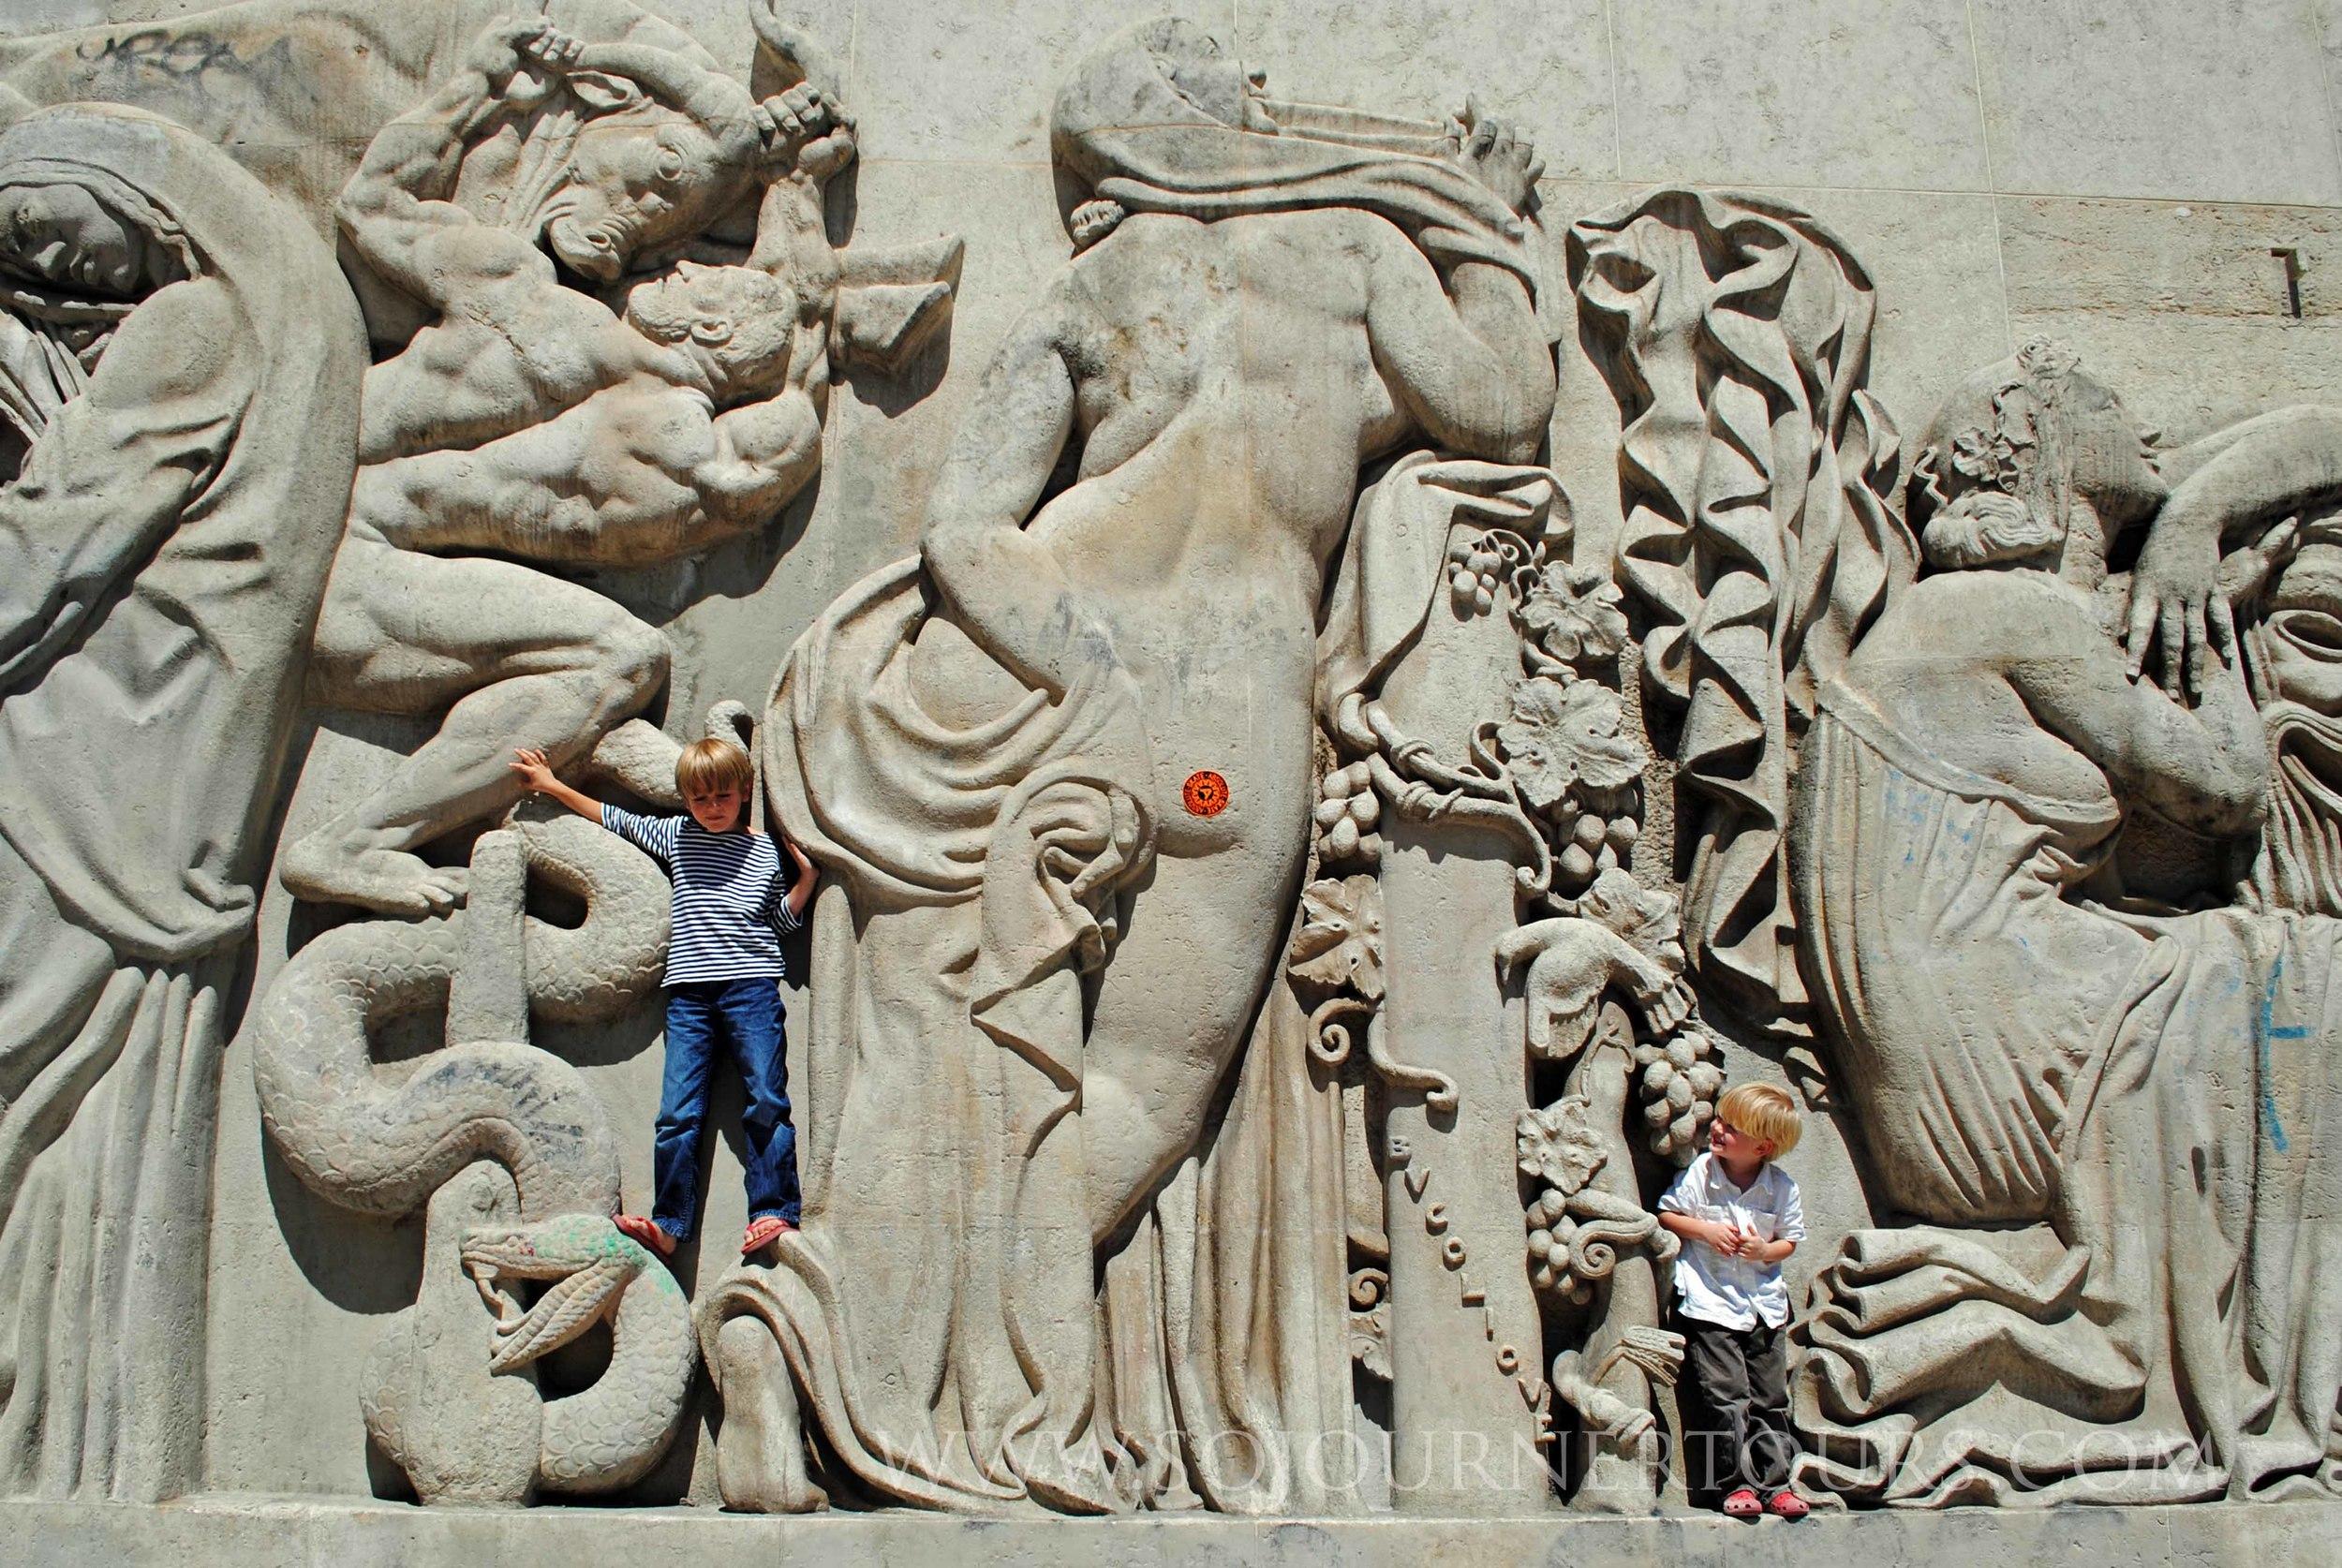 Museum of Modern Art: Paris, France (Sojourner Tours)